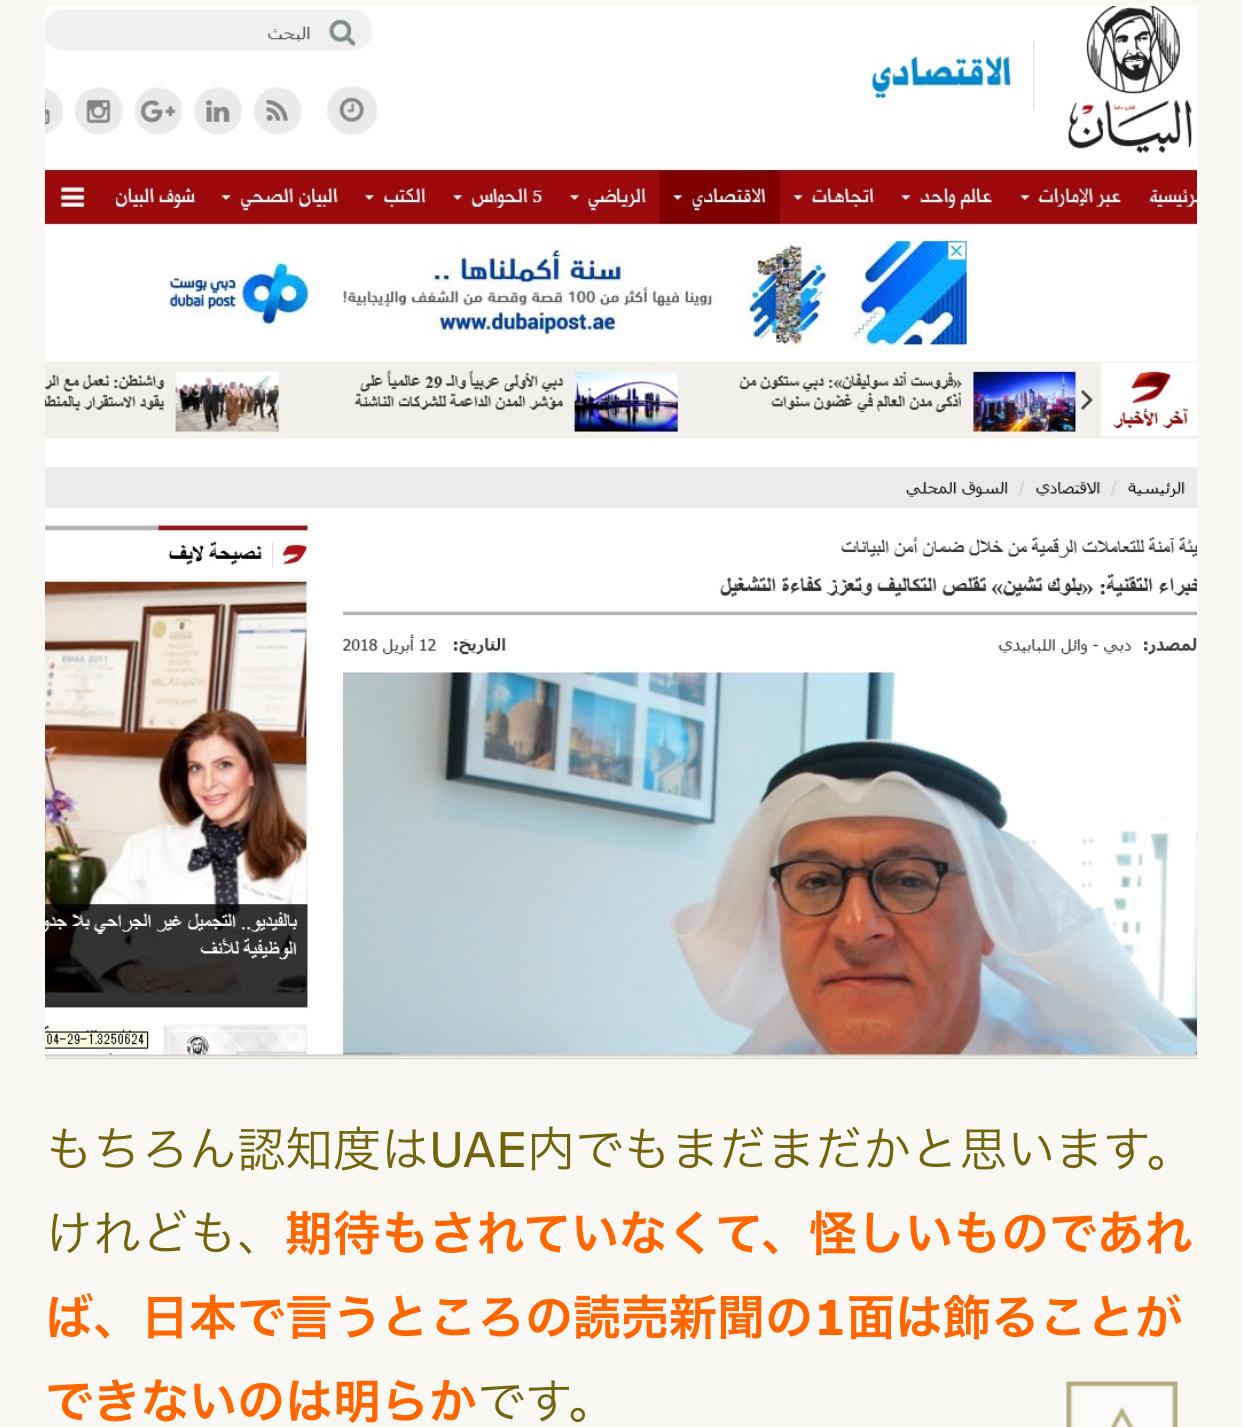 press release on Arabic media